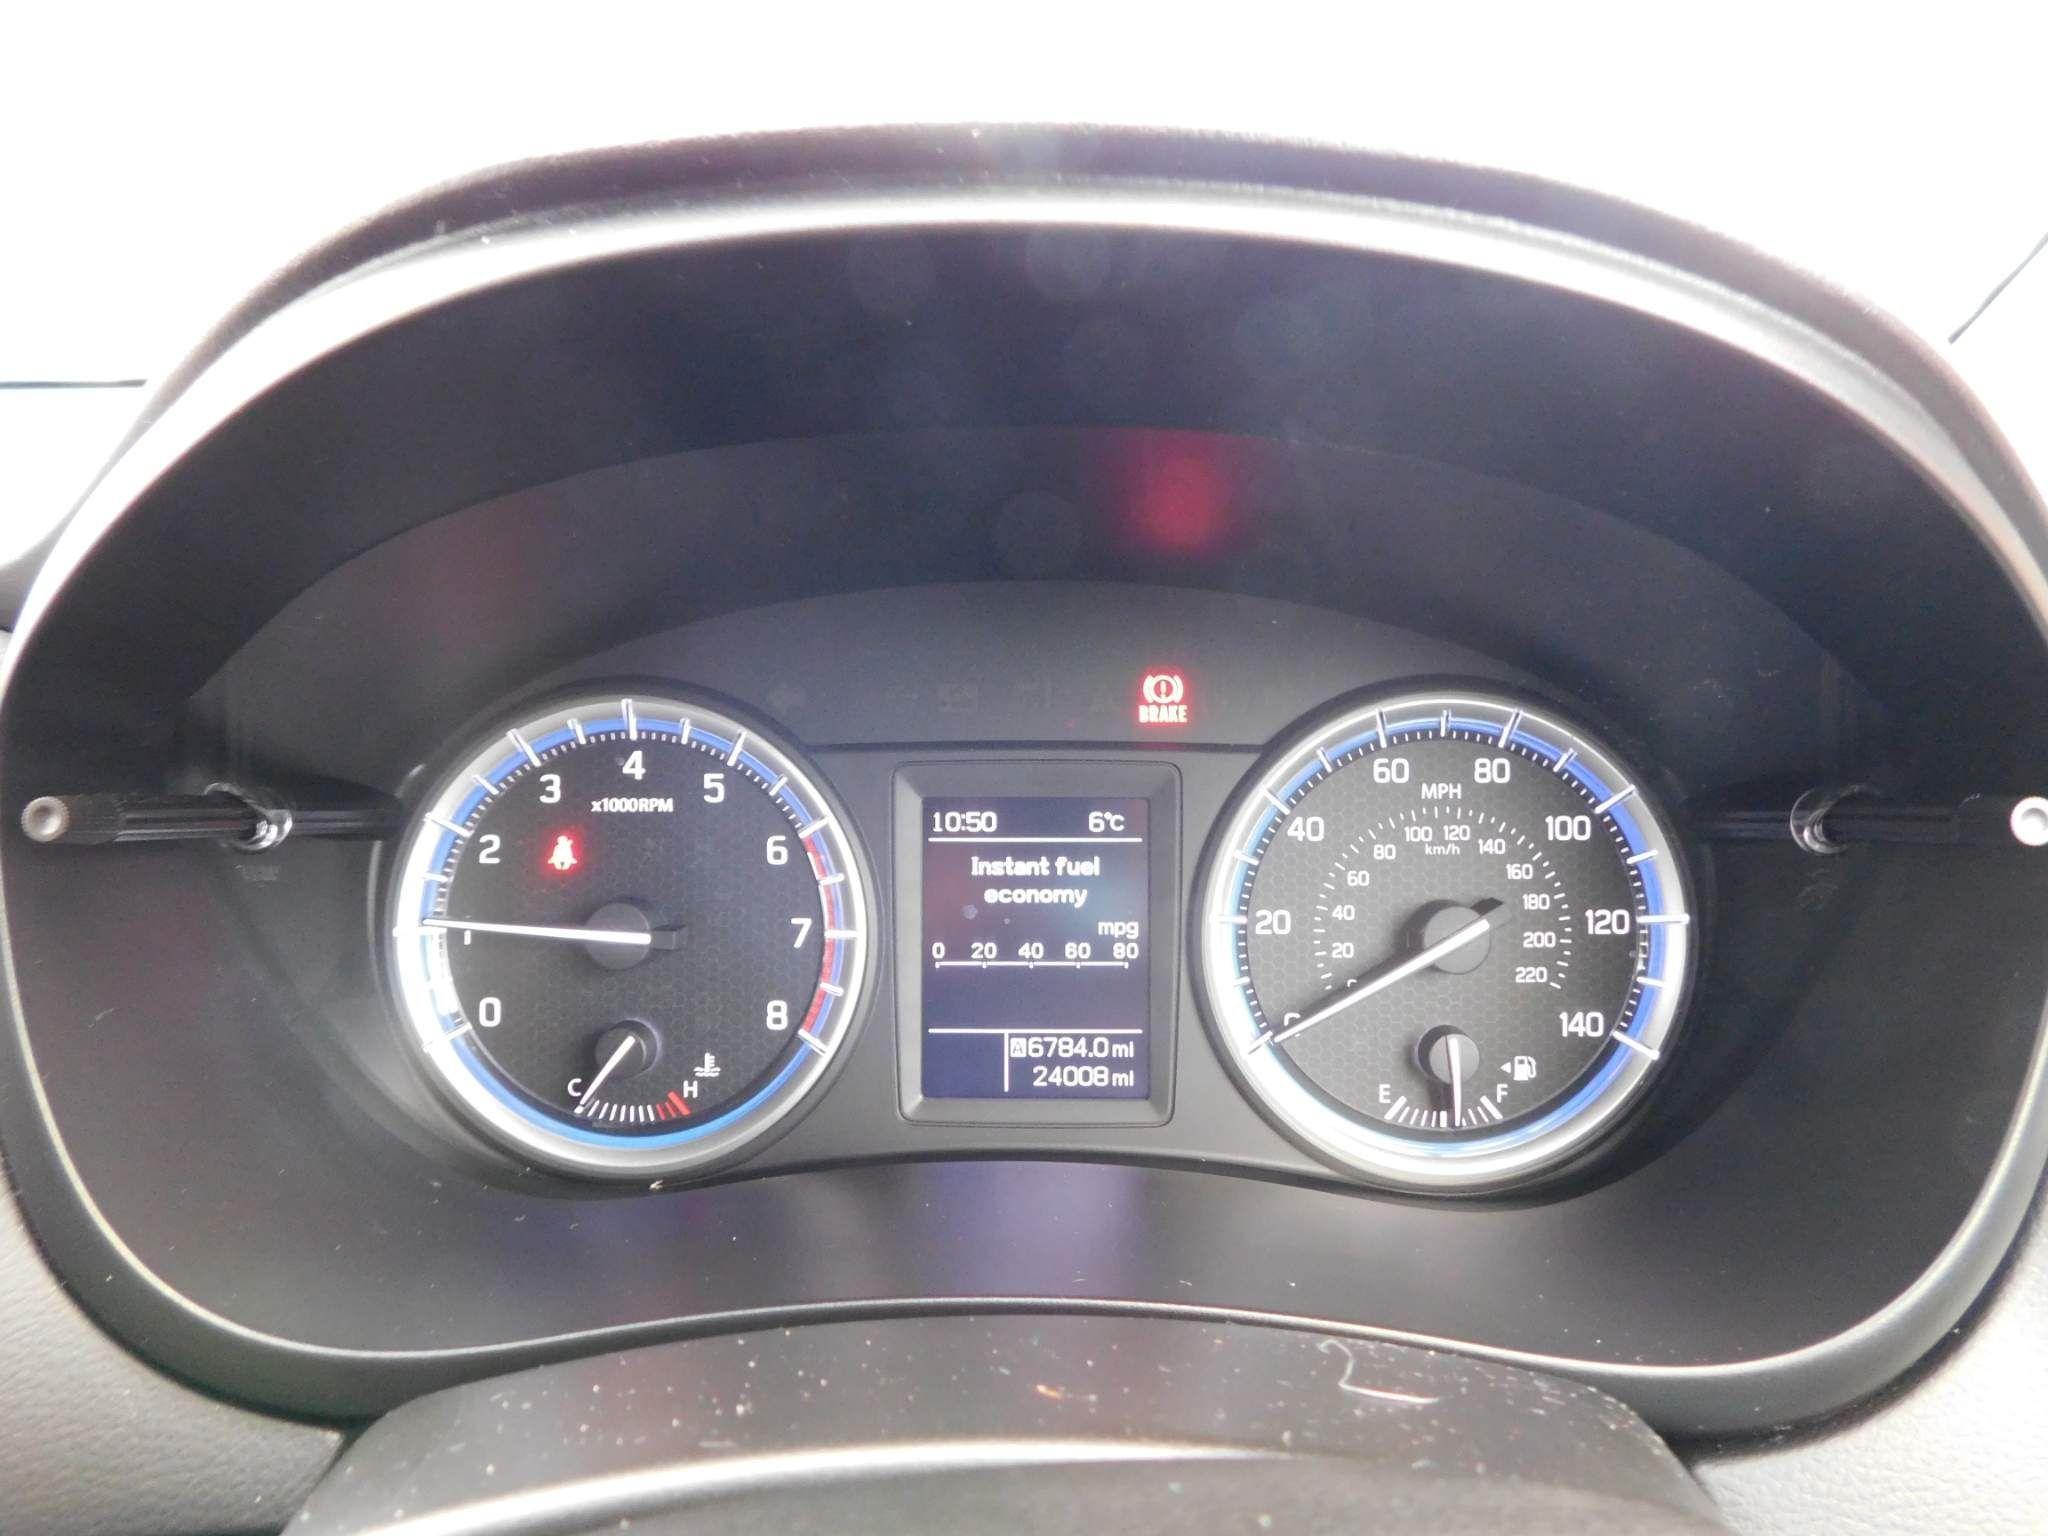 2018 SUZUKI SX4 S-Cross 1.0 Boosterjet SZ-T Petrol Manual due in sample pics – Meadow Cars Carrickfergus full